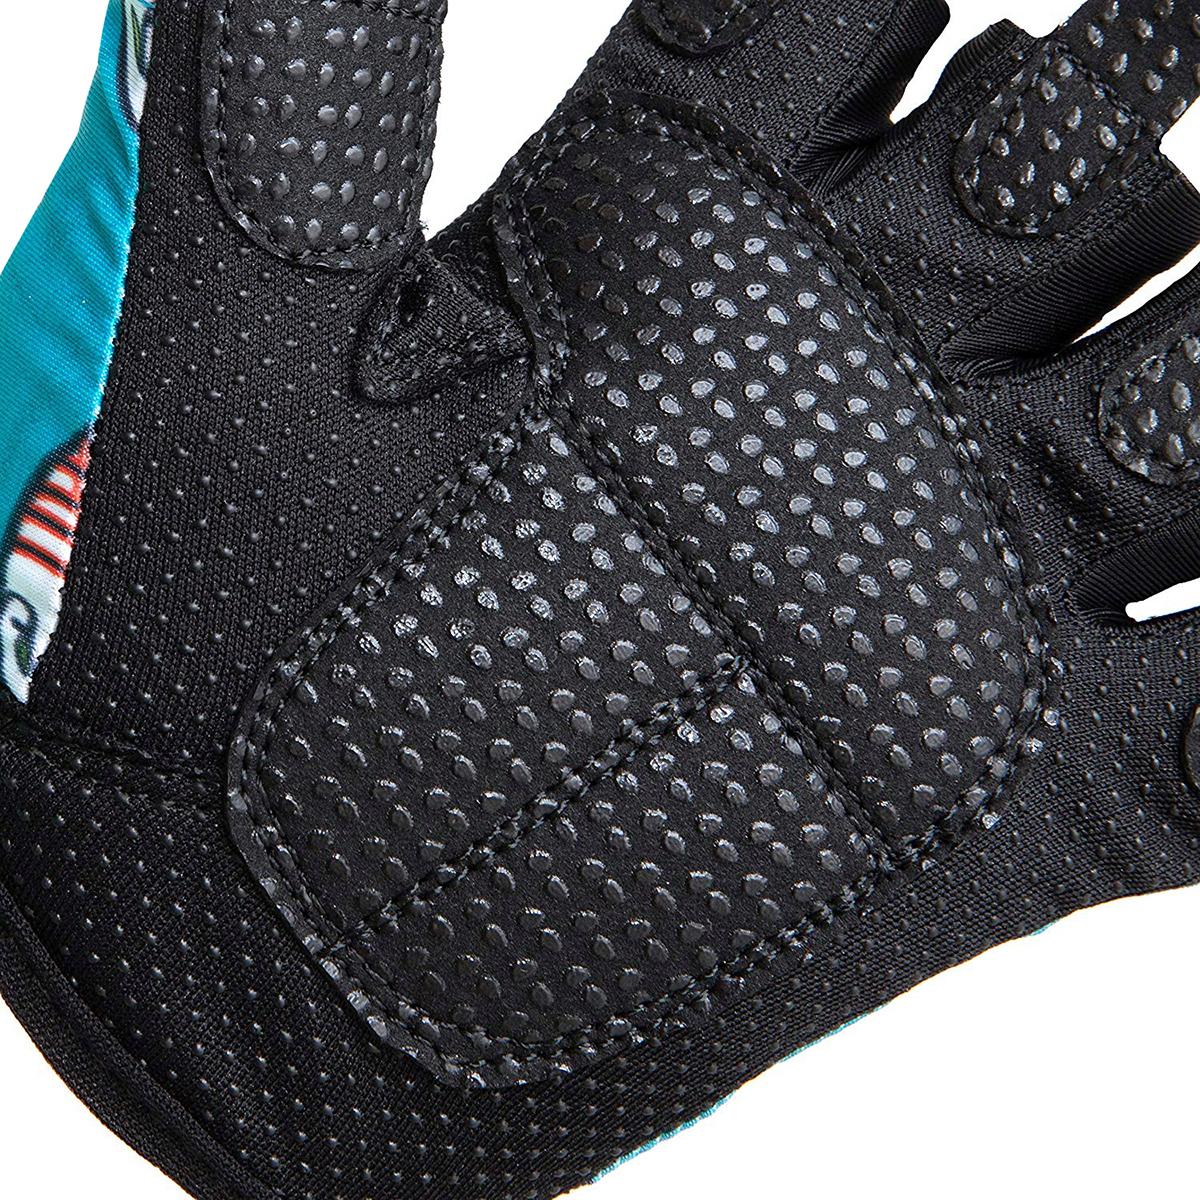 9cb2f7cbeb Contraband Sports 5237 Pink Label Sugar Skull Weight Lifting Gloves ...